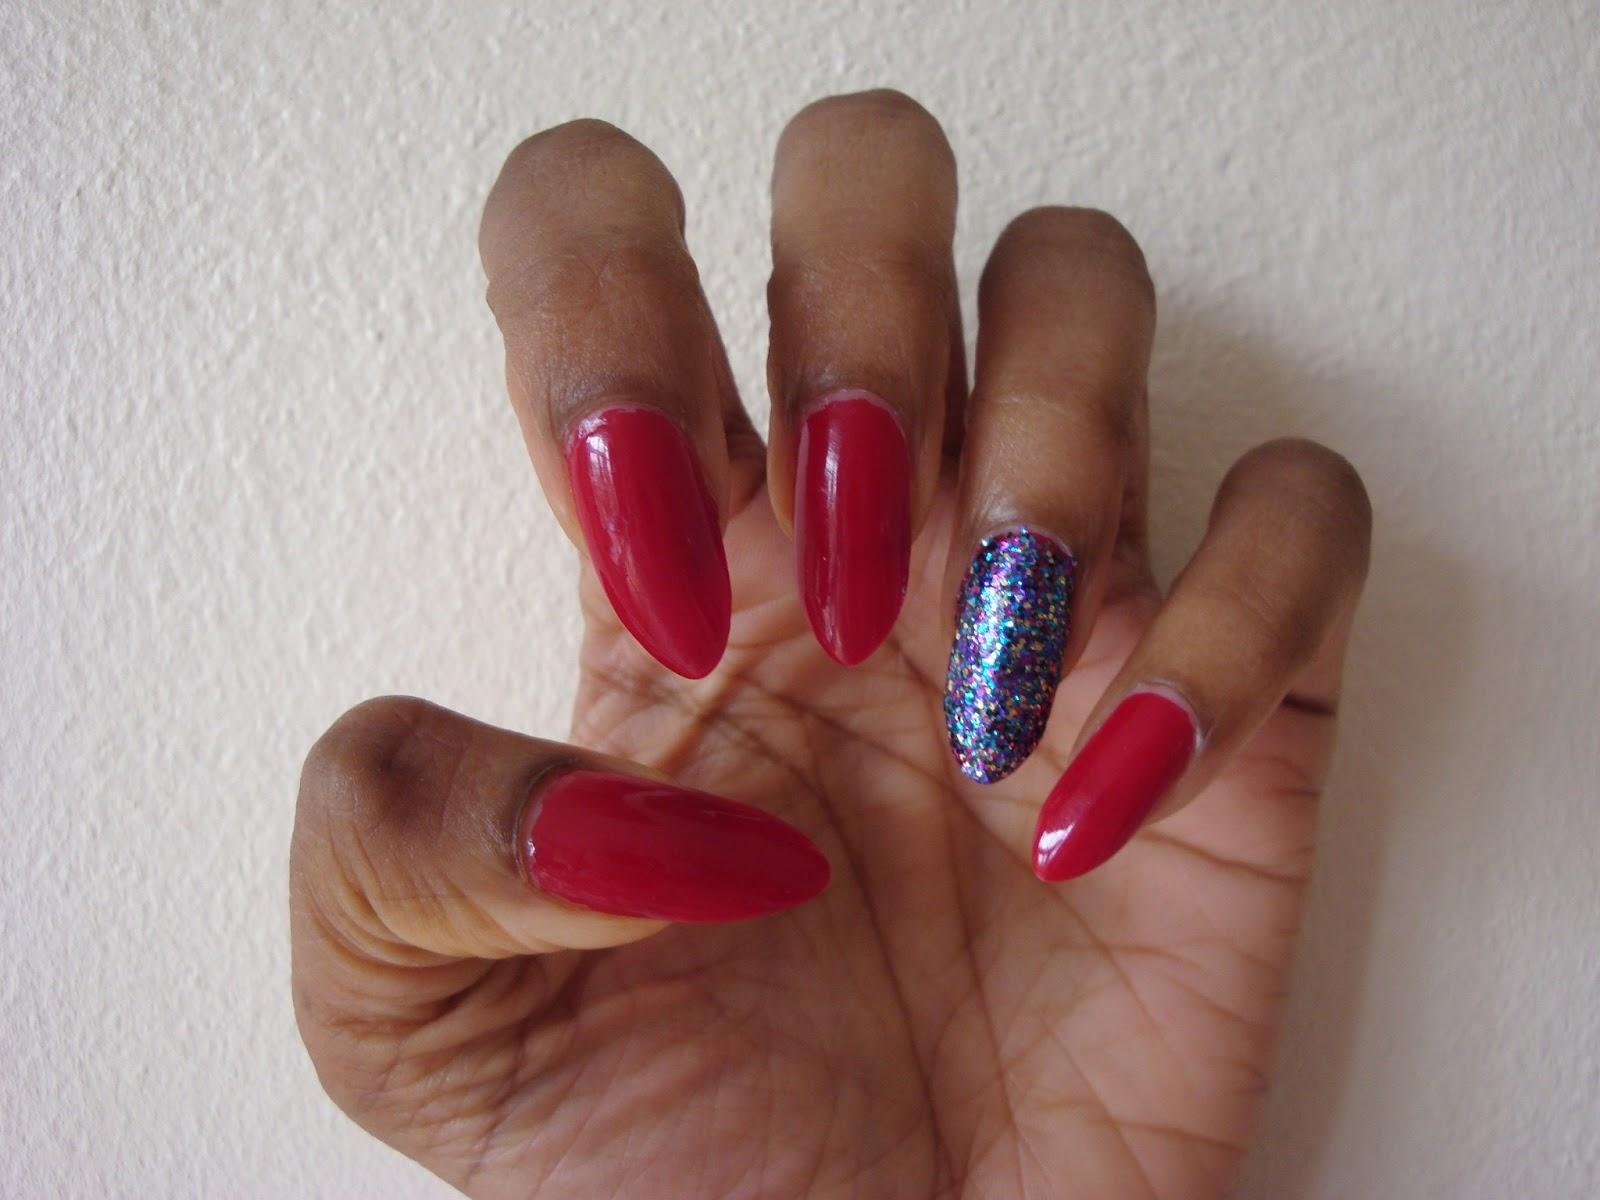 ArtzeeNailz: Red Nails with Glitter Feature Nail